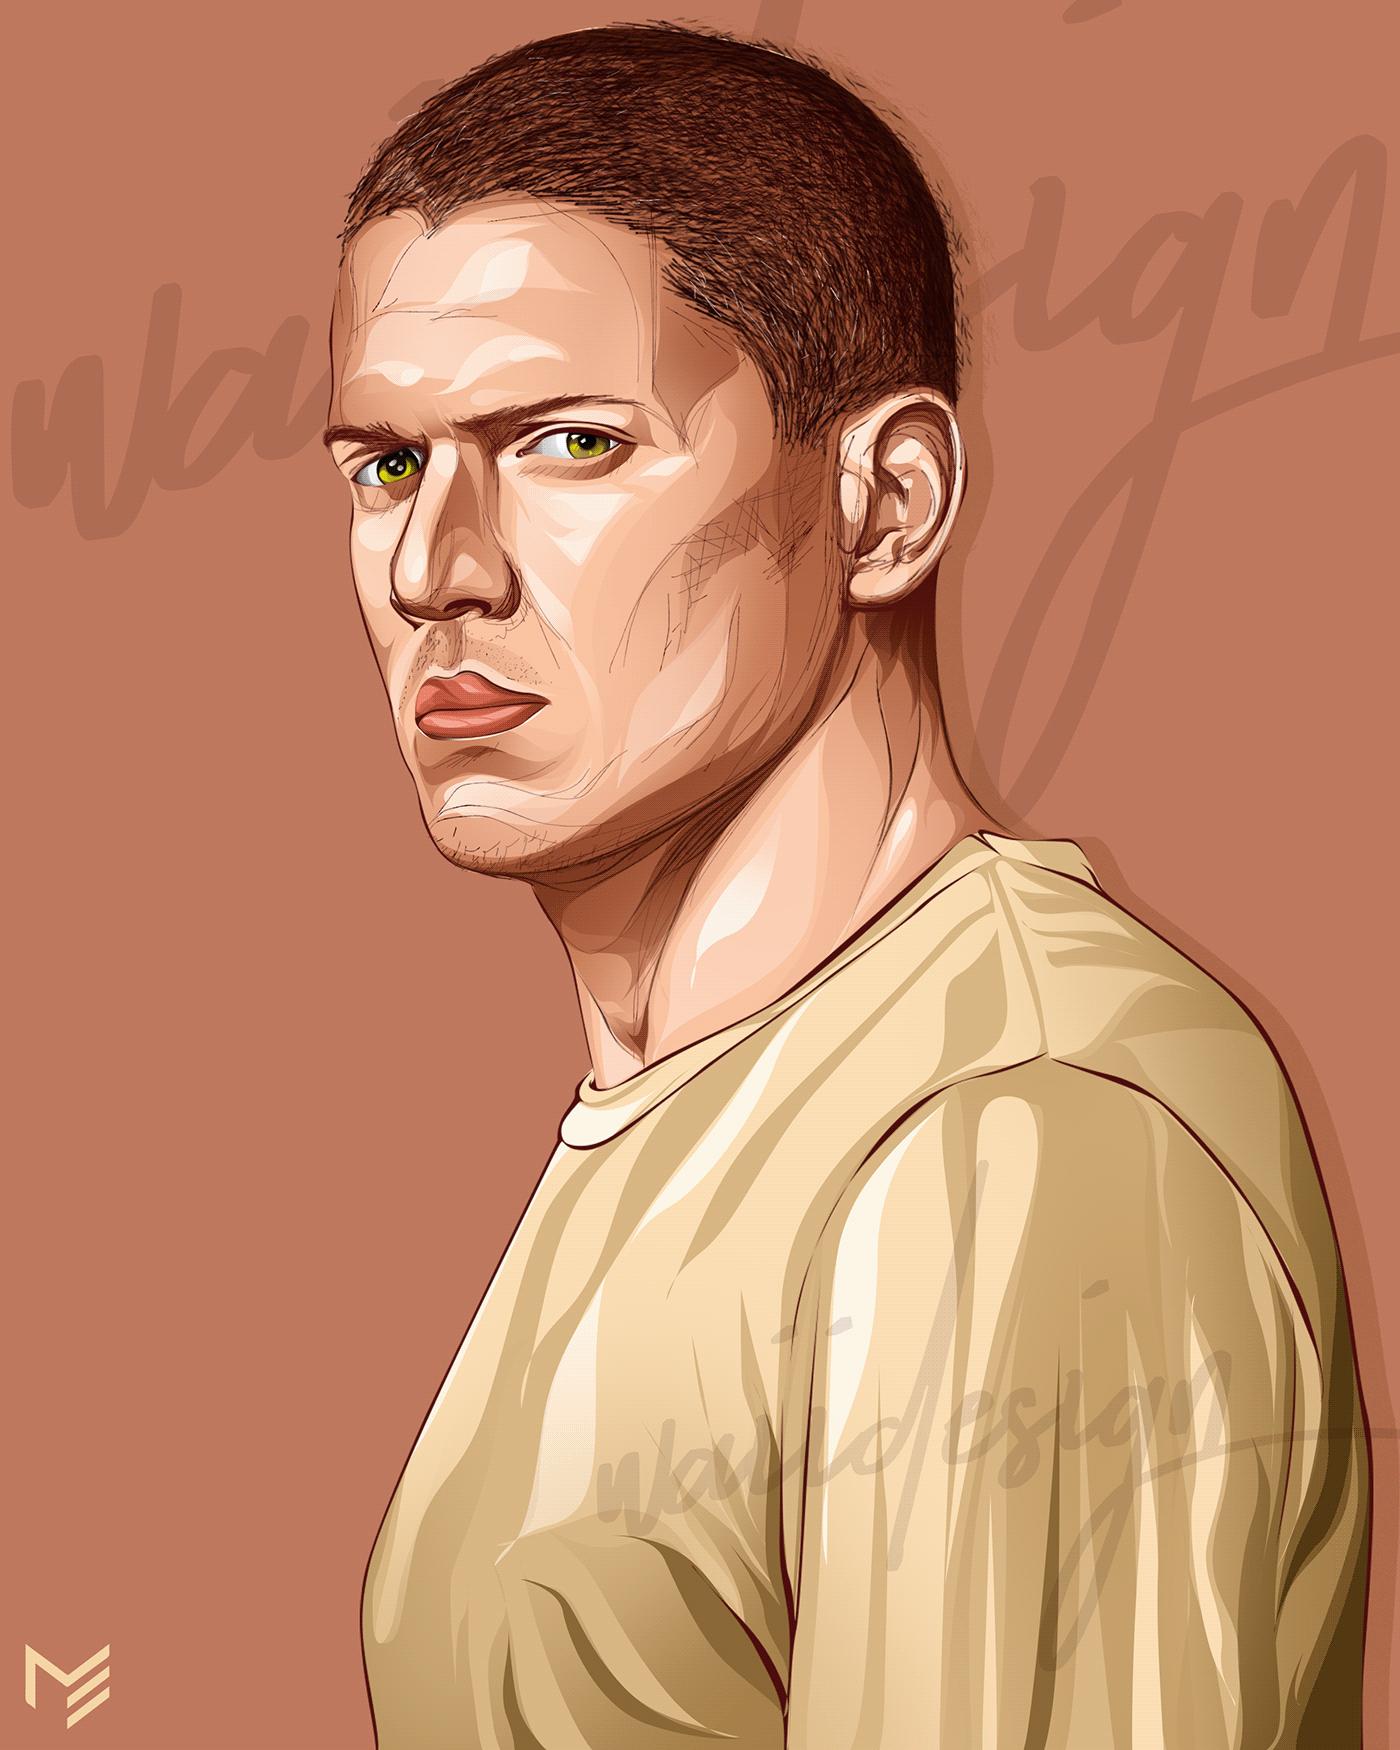 art design ILLUSTRATION  Michael Scofield photoshop portrait poster Prison Break vectorart vexel